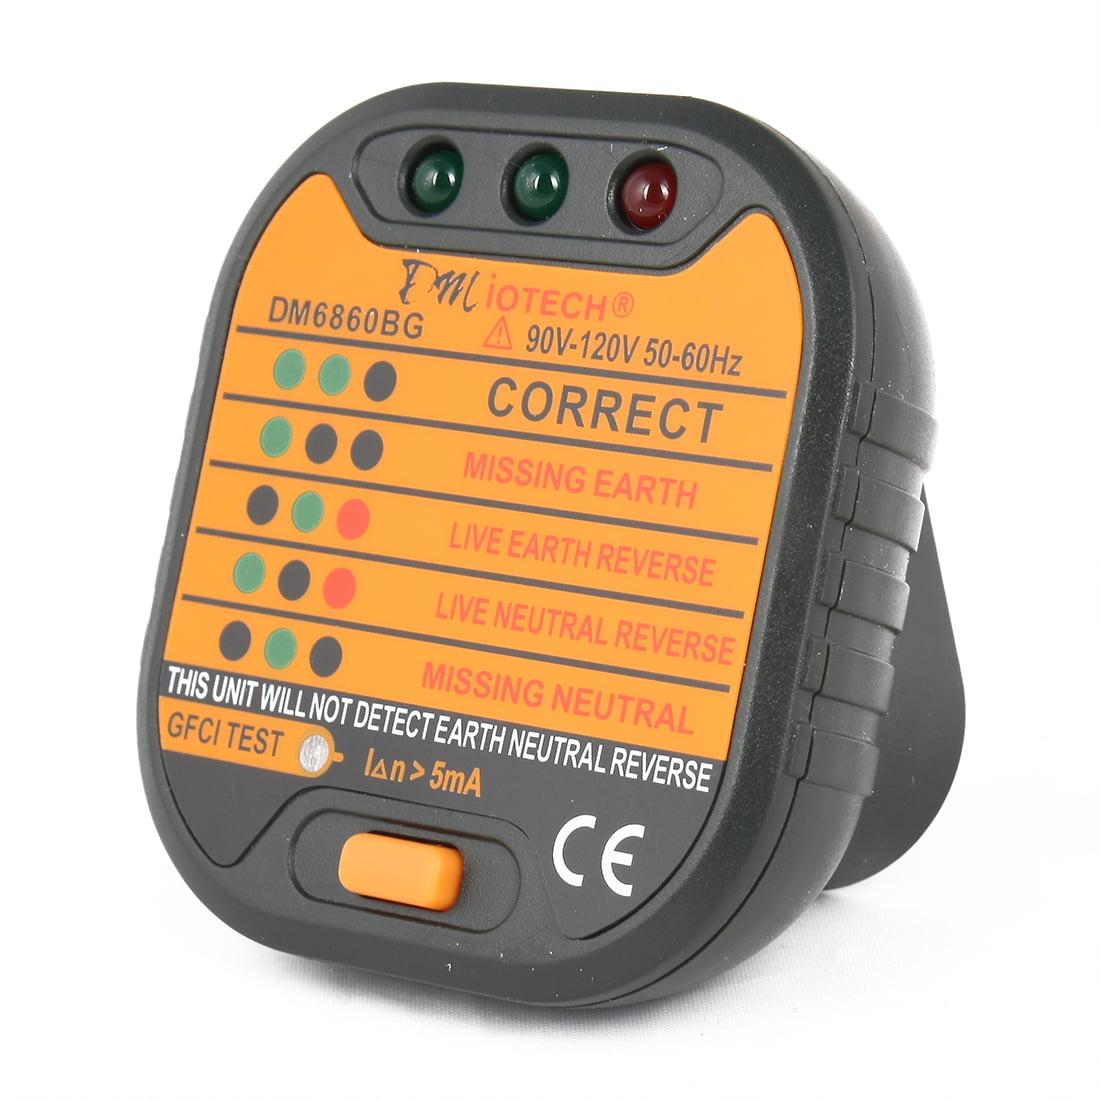 Dm6860bg Power Socket Outlet Tester Polarity Checker Gfci Test Us Ground Fault Circuit Interrupter China Electronic And Digital Plug 110v 120v